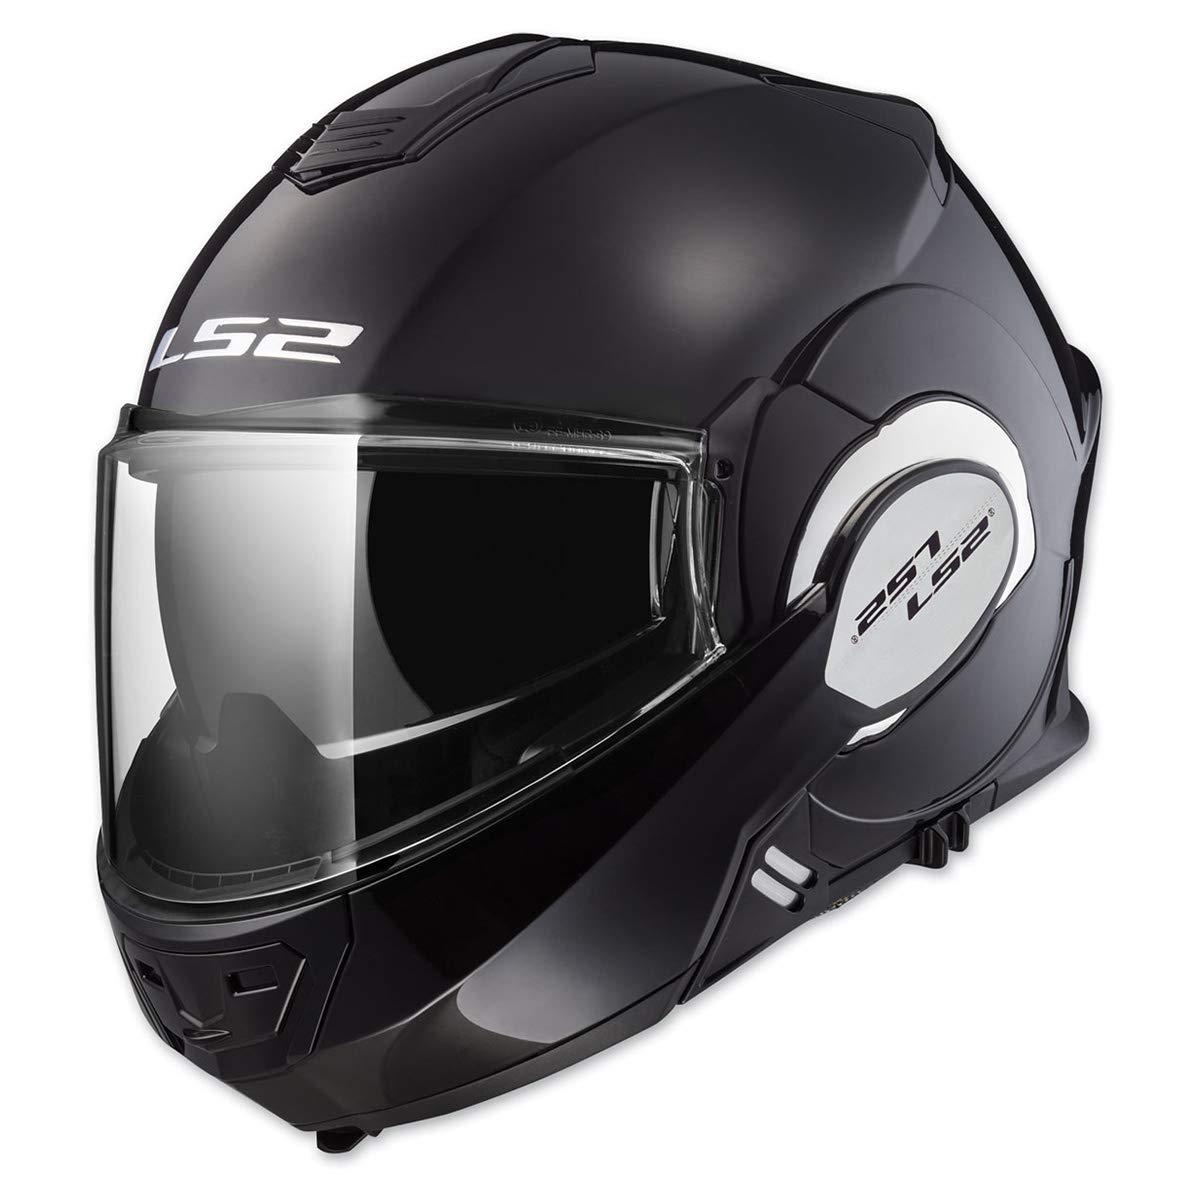 FREE DARK VISOR MOTORCYCLE LS2 FF353 RAPID CARRERA MATT BLACK HI VIZ YELLOW FULL FACE HELMET Motorbike Scooter Rider On Road Track Racing Touring Urban Sports ECE Certified Helmet